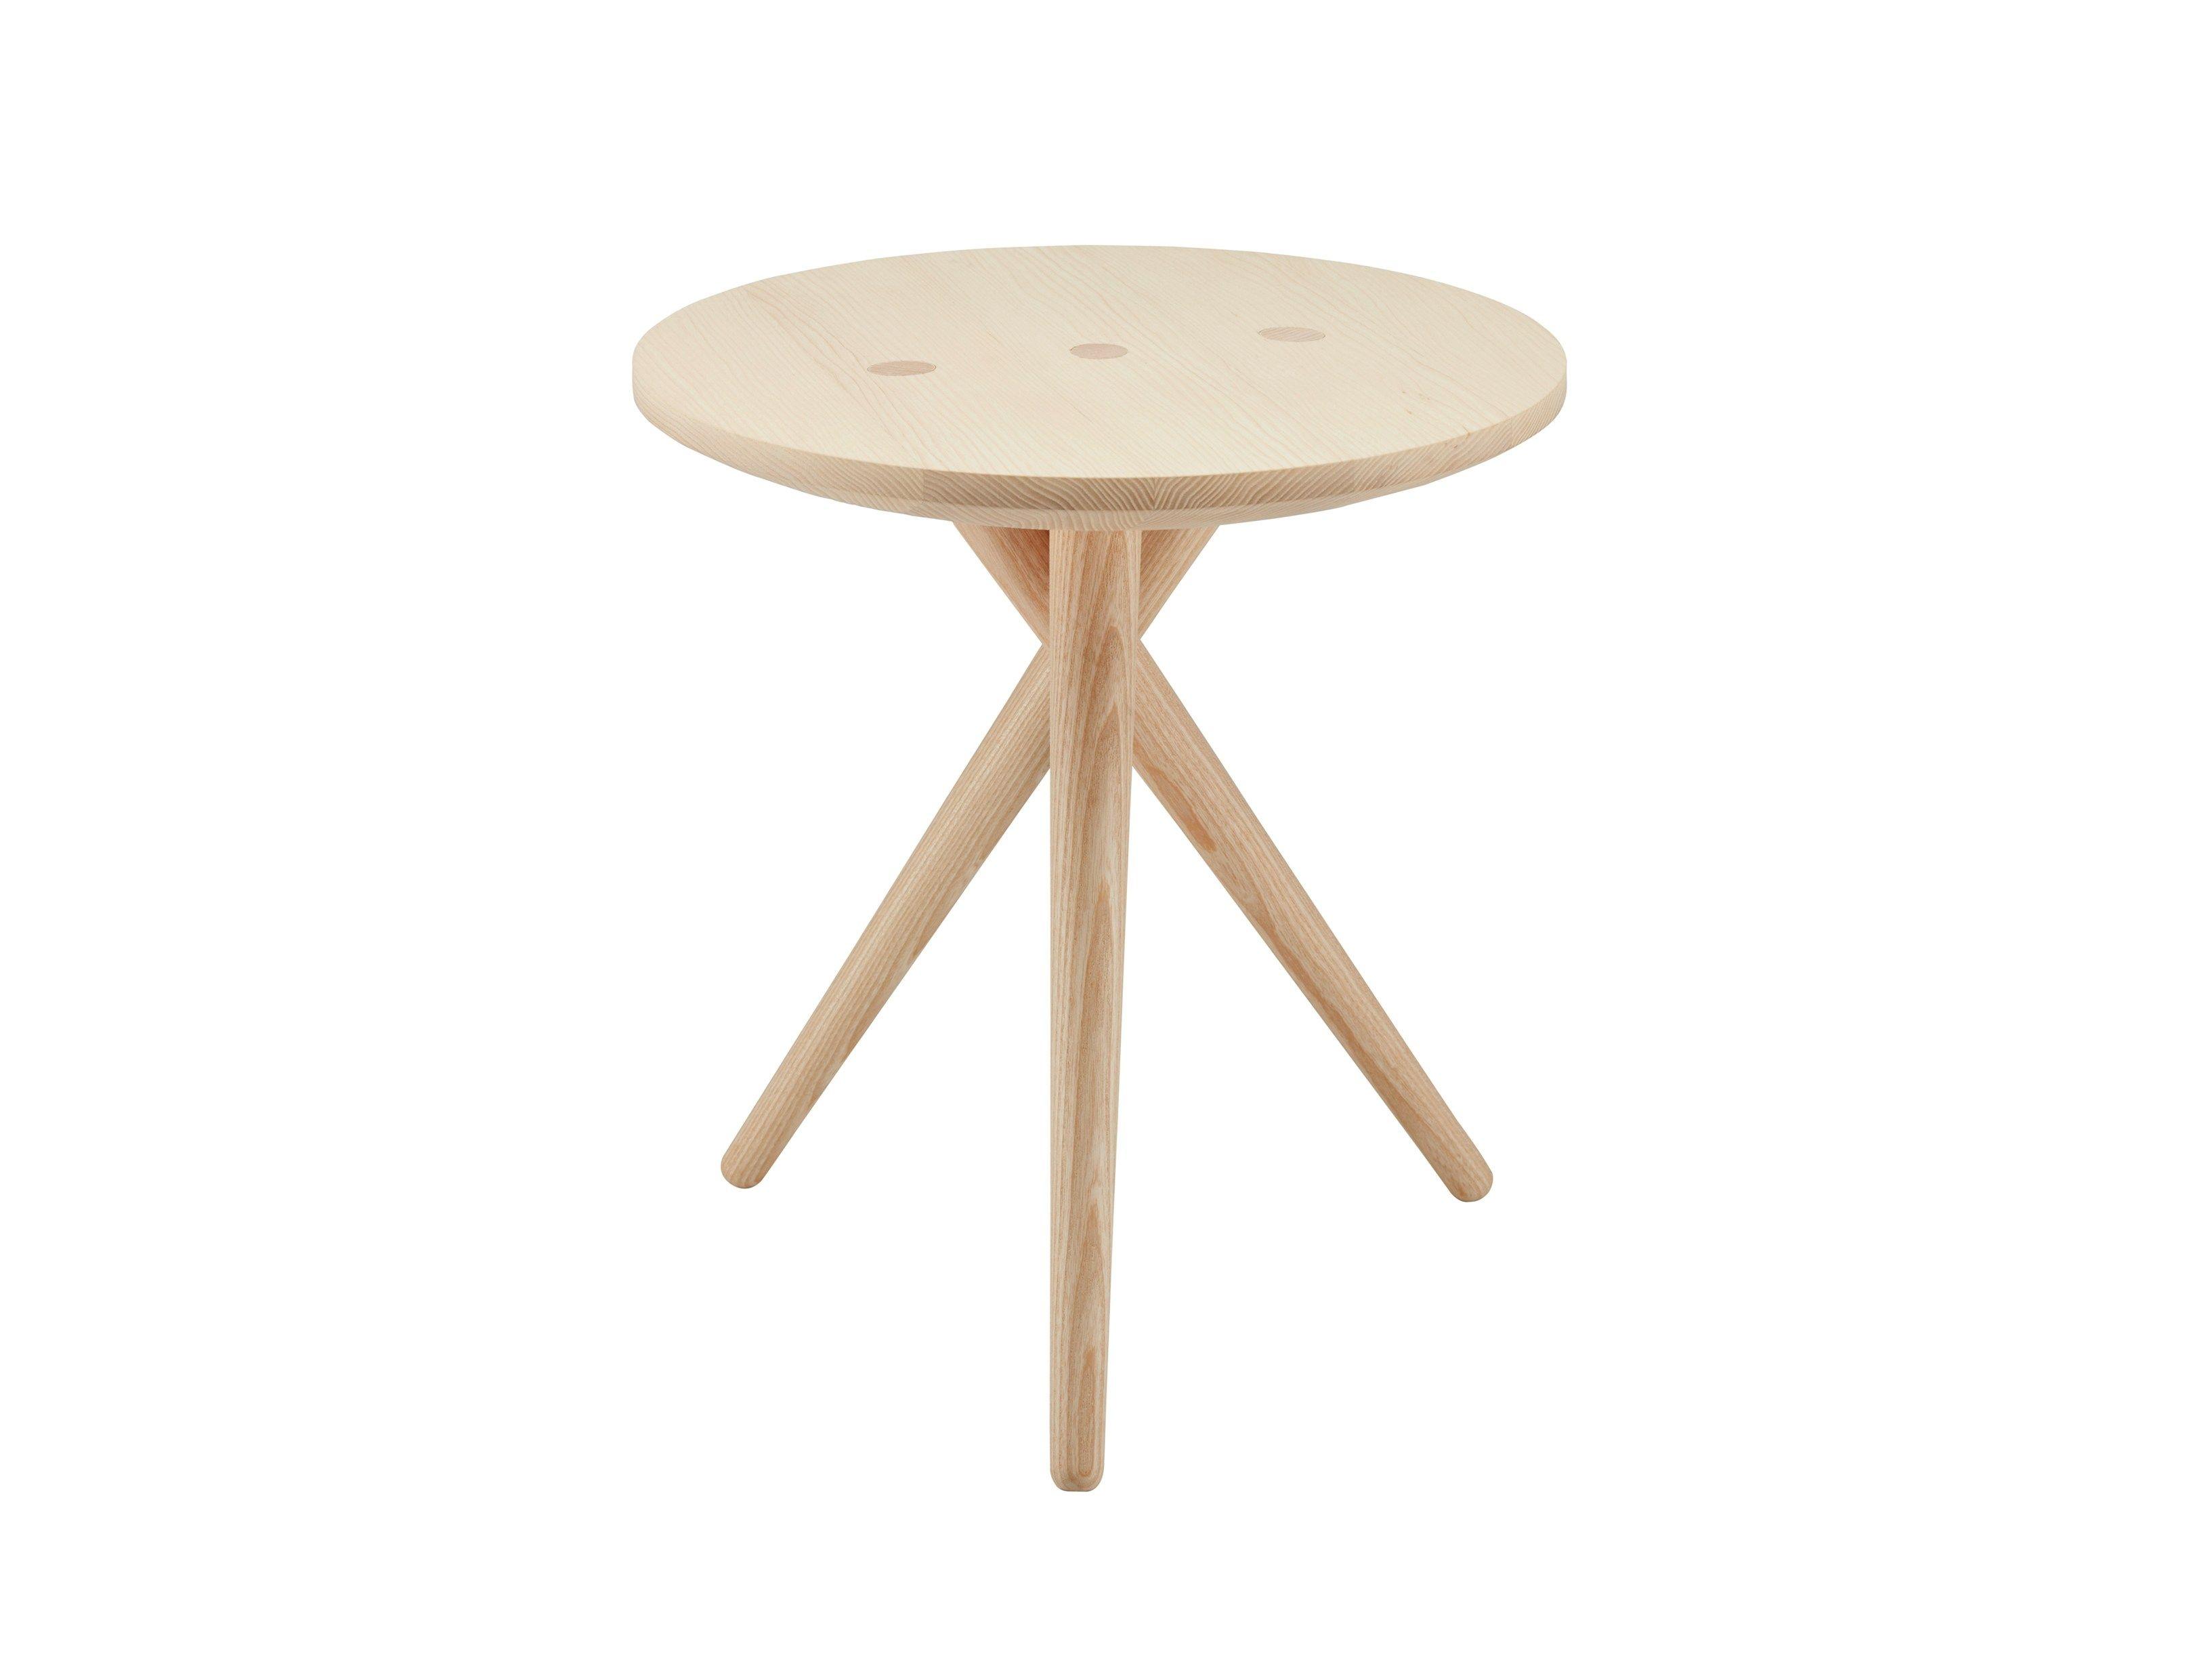 735d7d1aaba94f9ba0331cfad8399011 Luxe De Mini Table Basse Concept